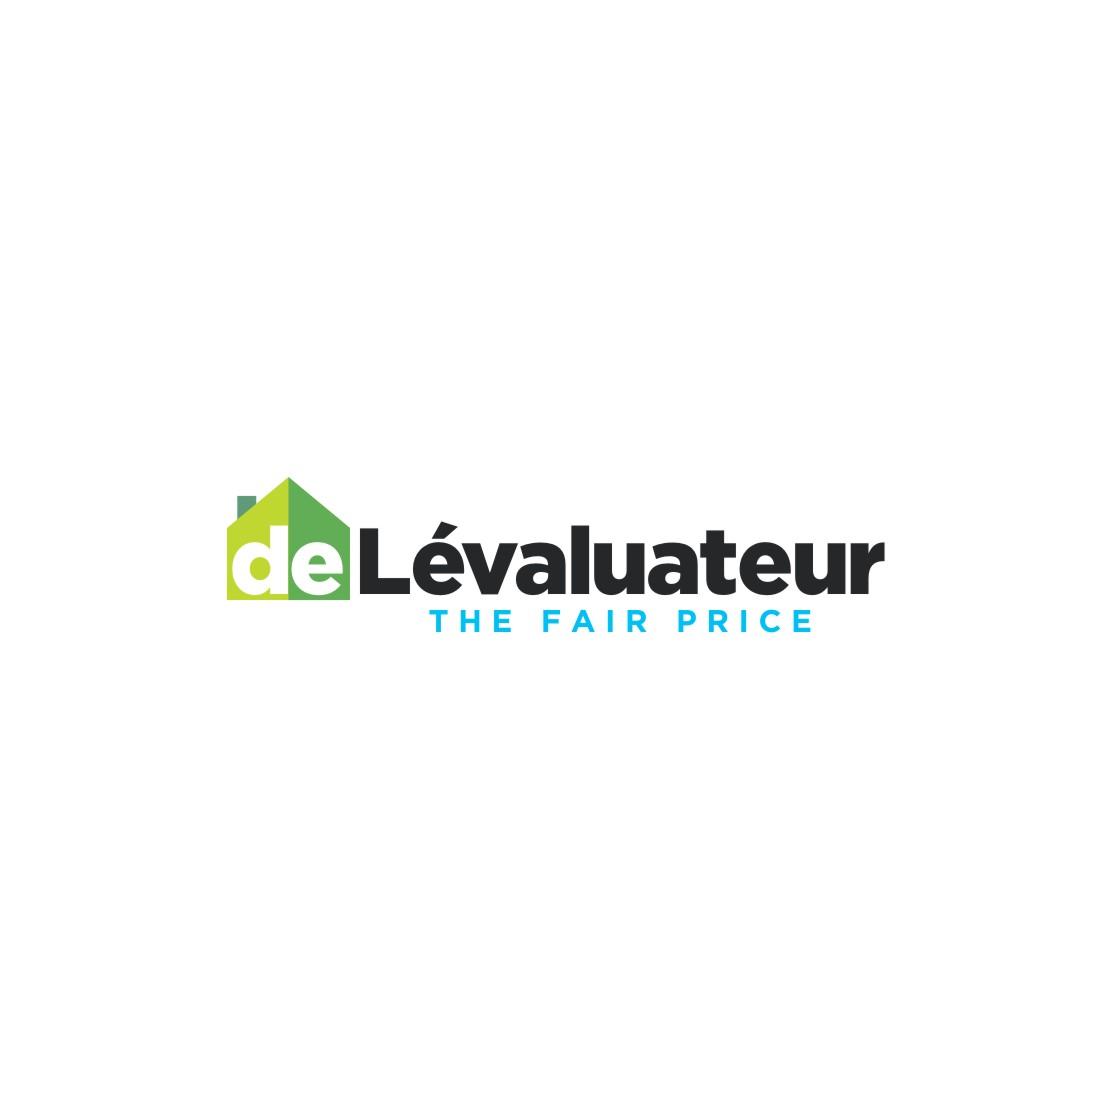 Logo Design by untung - Entry No. 44 in the Logo Design Contest Brand Logo Design et Icon design for brand logo de Lévaluateur.